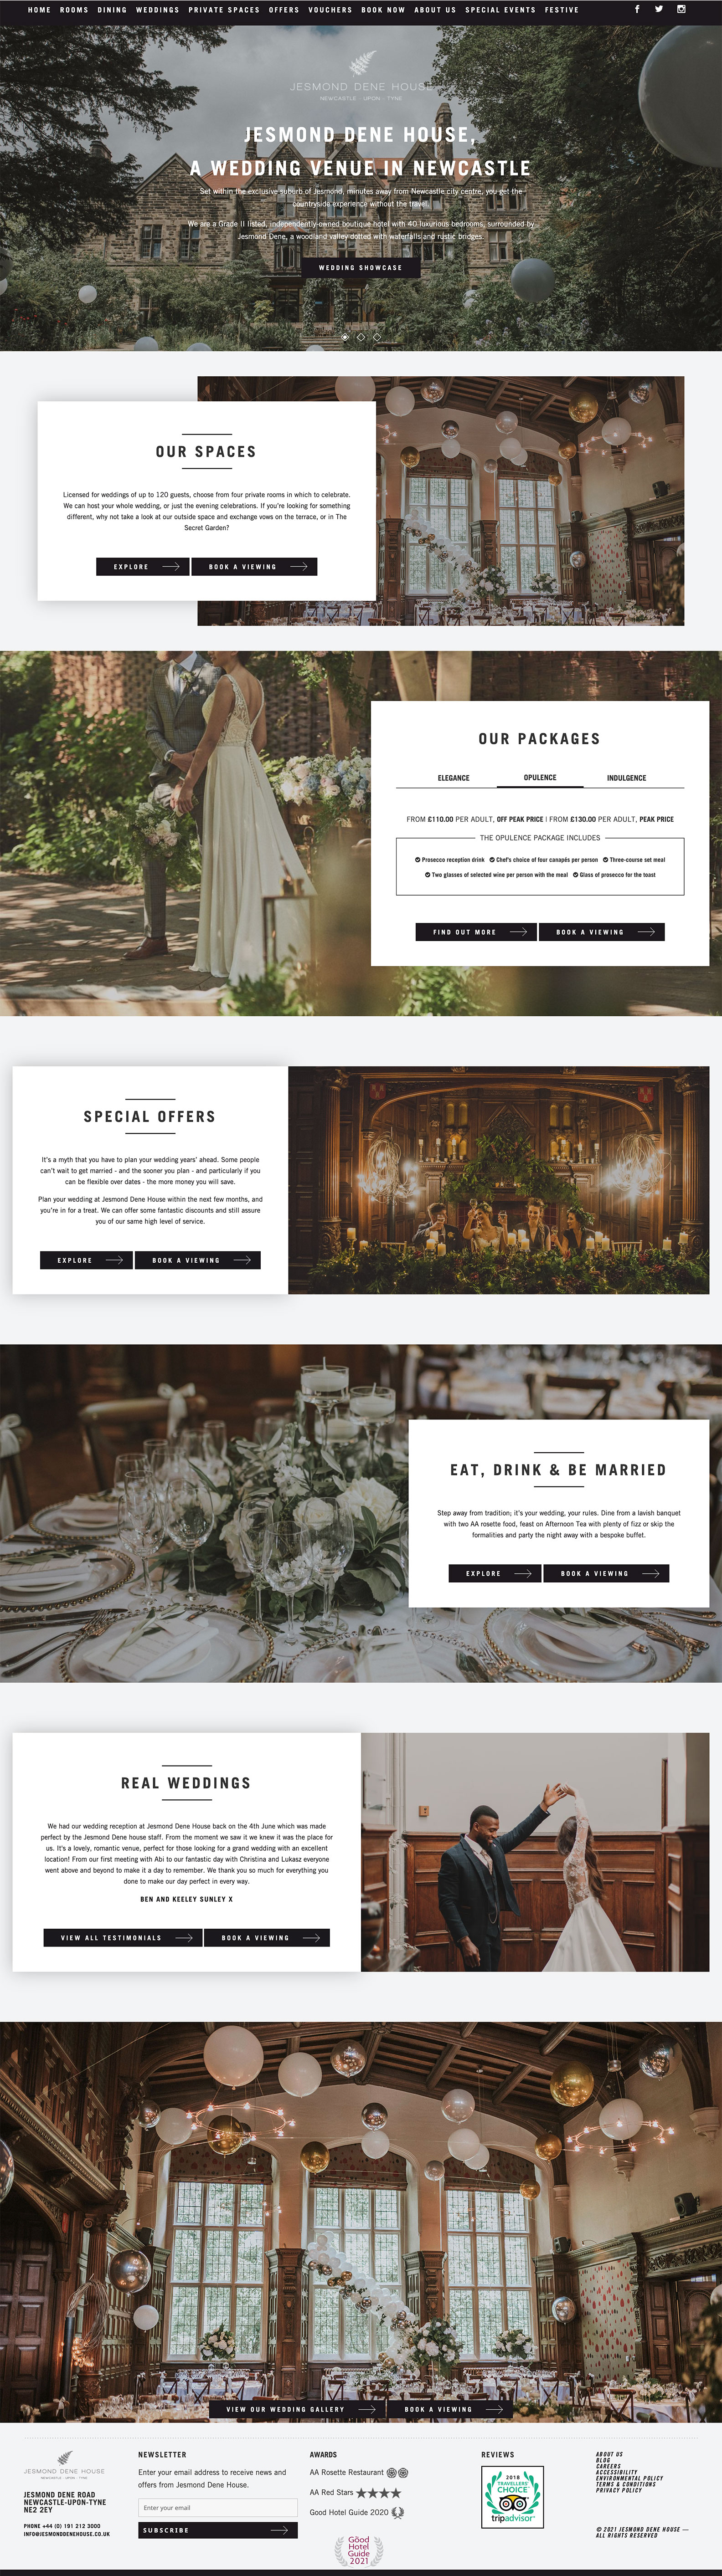 Desktop view of Jesmond Dene House website